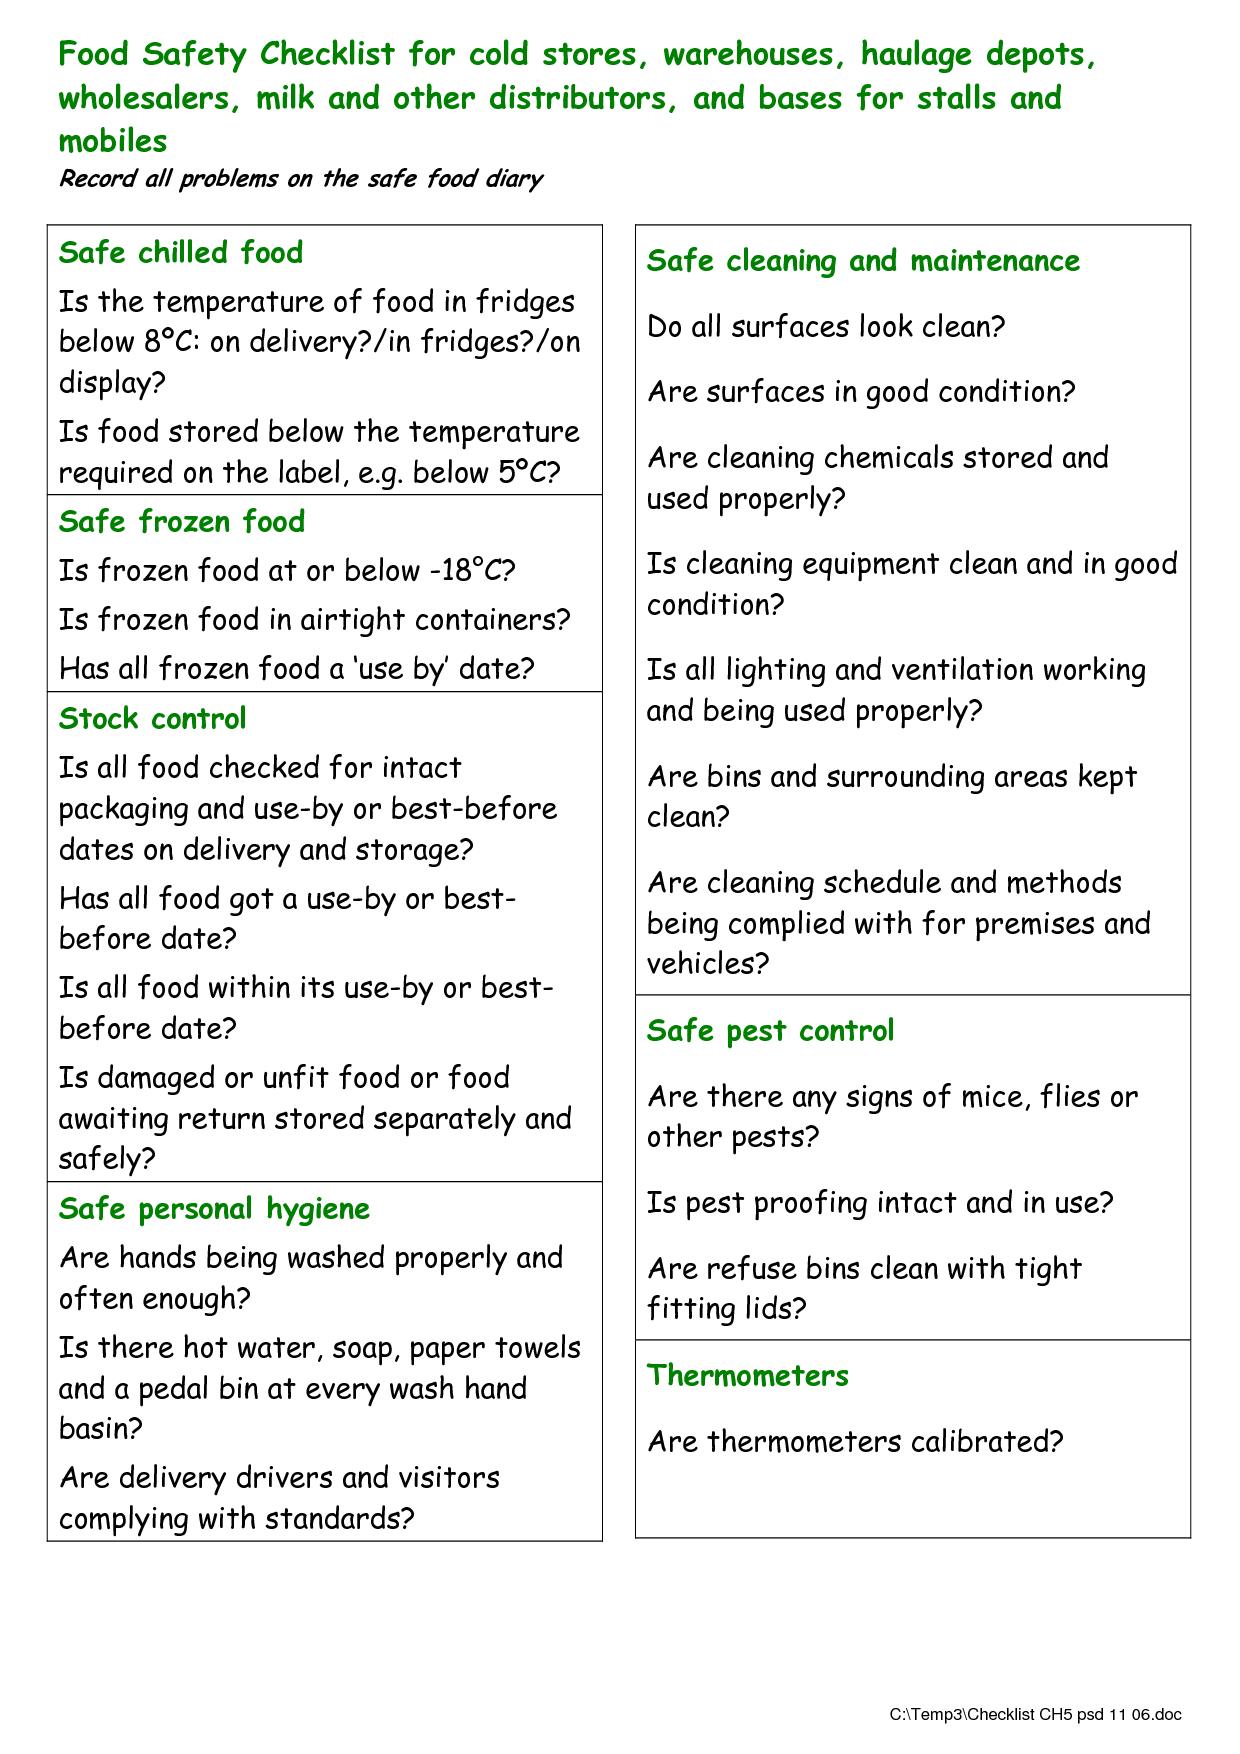 food checklist template food safety checklist for cold organising pinterest template. Black Bedroom Furniture Sets. Home Design Ideas